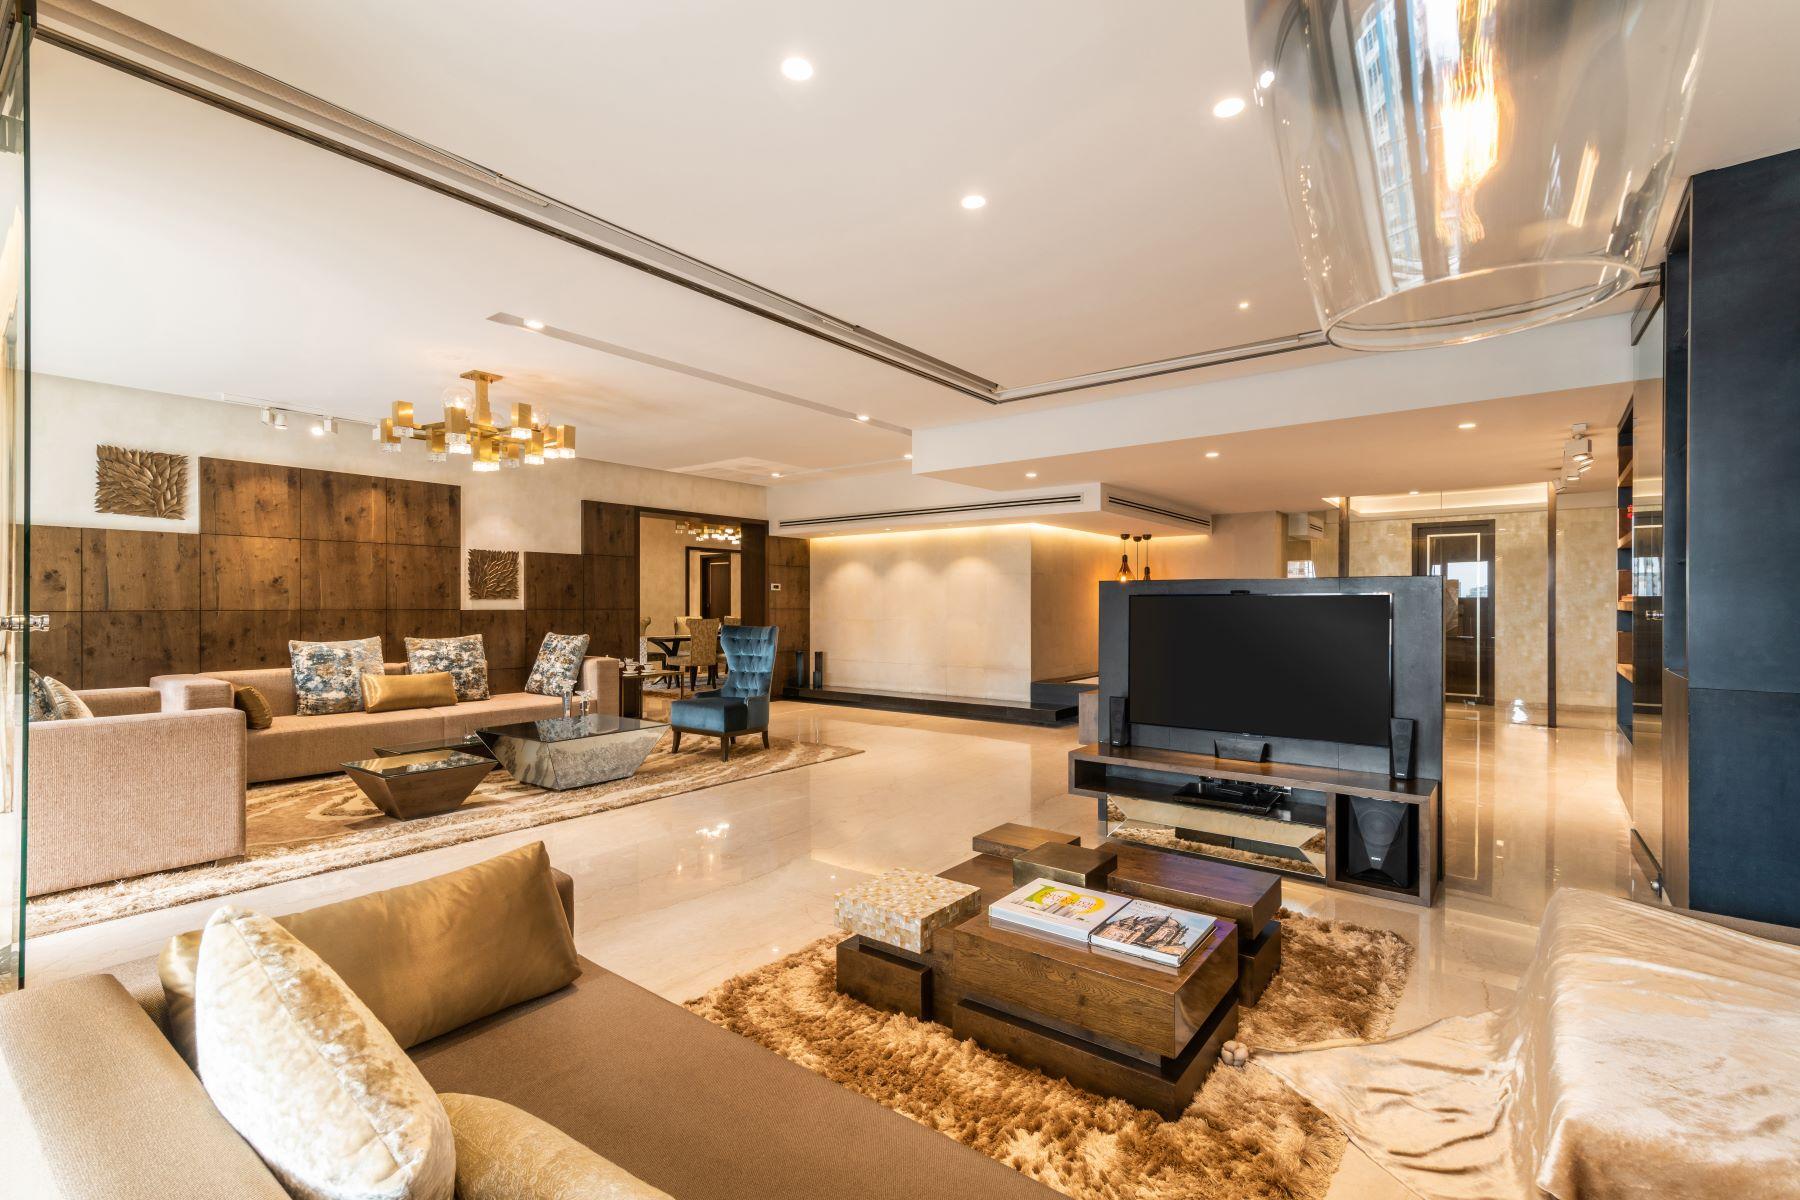 Apartments 为 出租 在 Signia Isles, Bandra Kurla Complex 孟买, 马哈拉托特拉邦 400051 印度